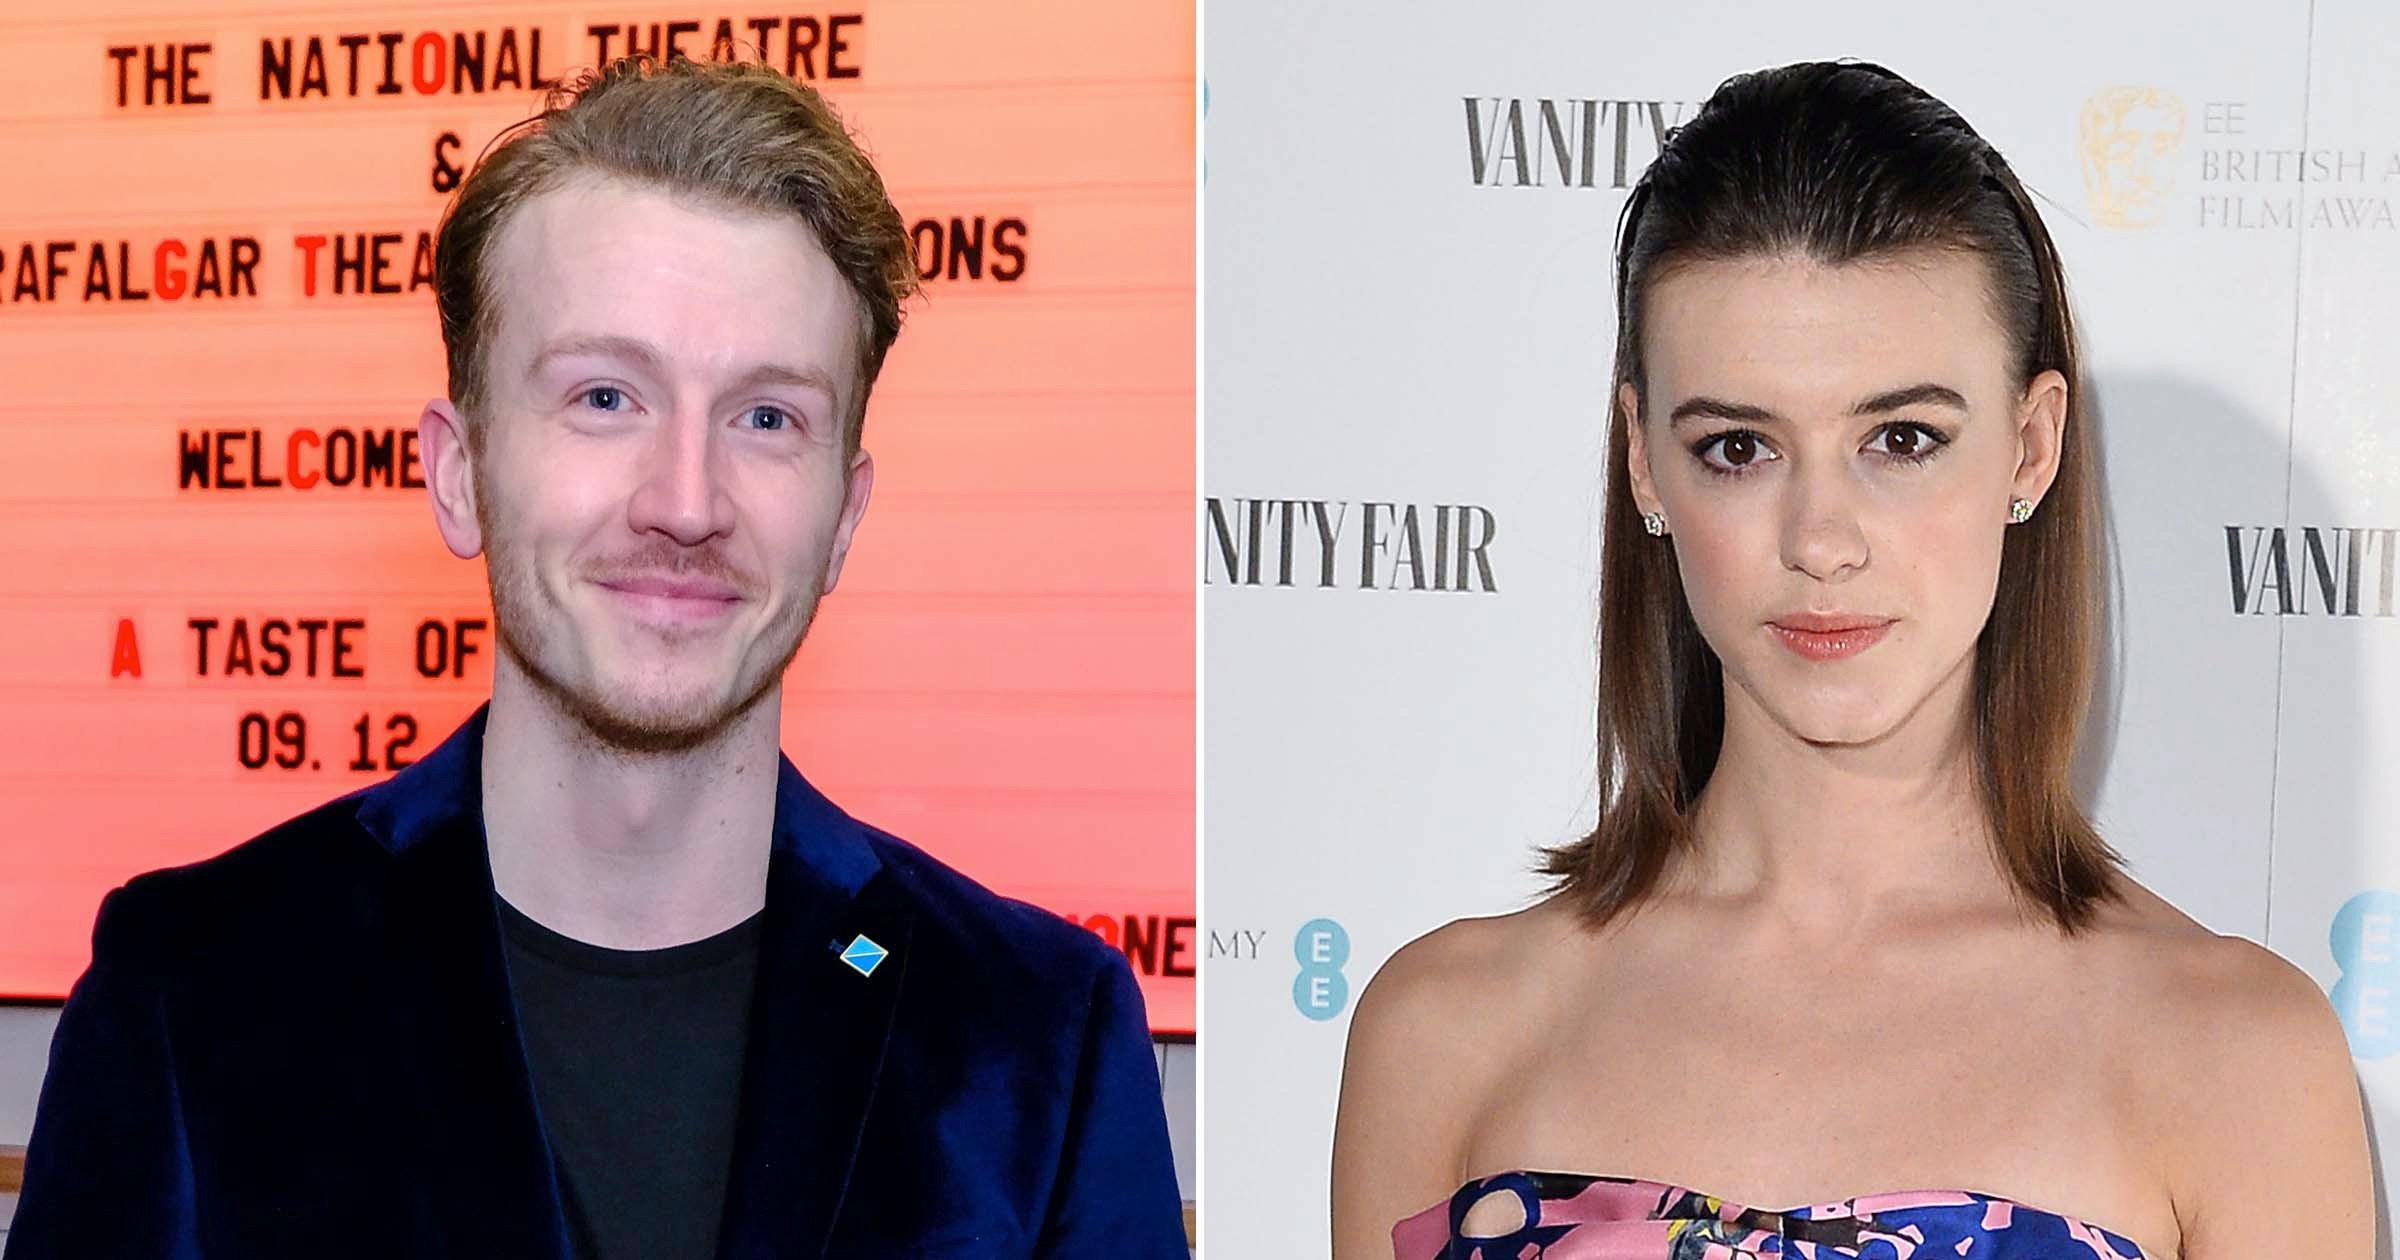 Normal People star Daisy Edgar-Jones 'splits from boyfriend Tom Varey': 'They're sad it didn't work'